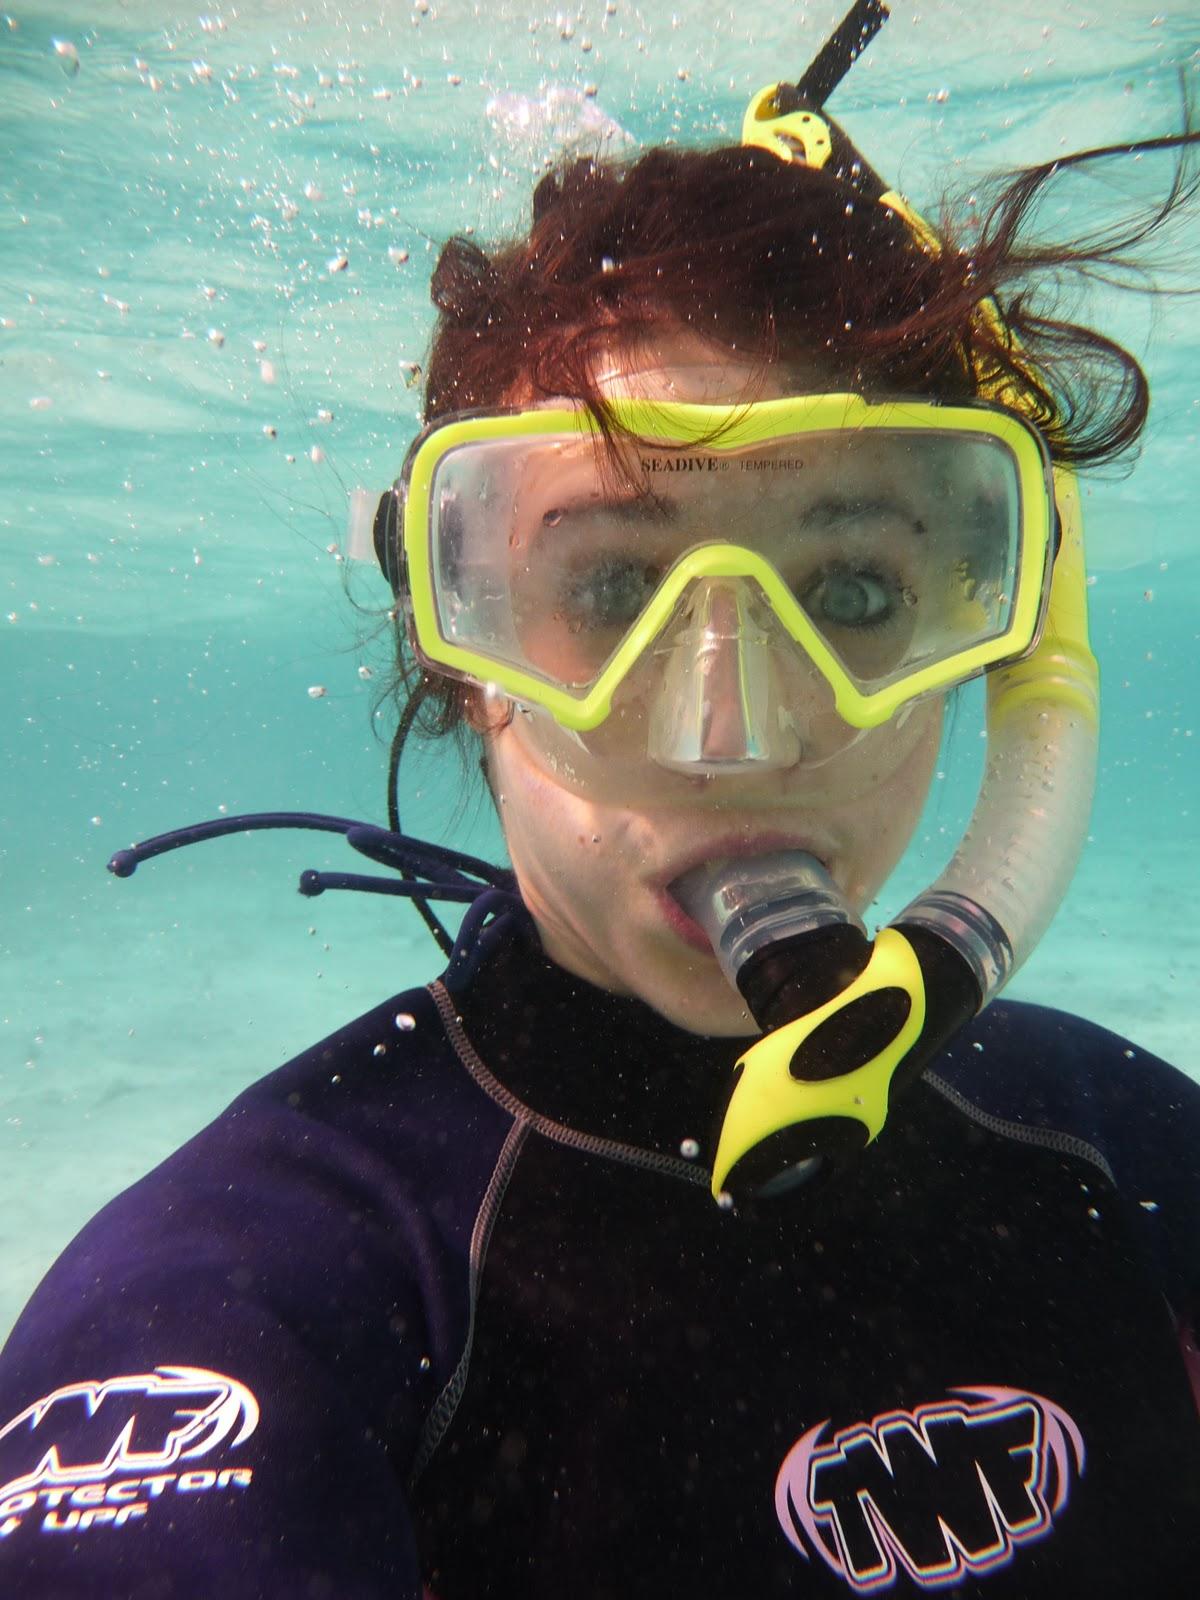 Hot Tub Girl. Underwater Video Camera - Video